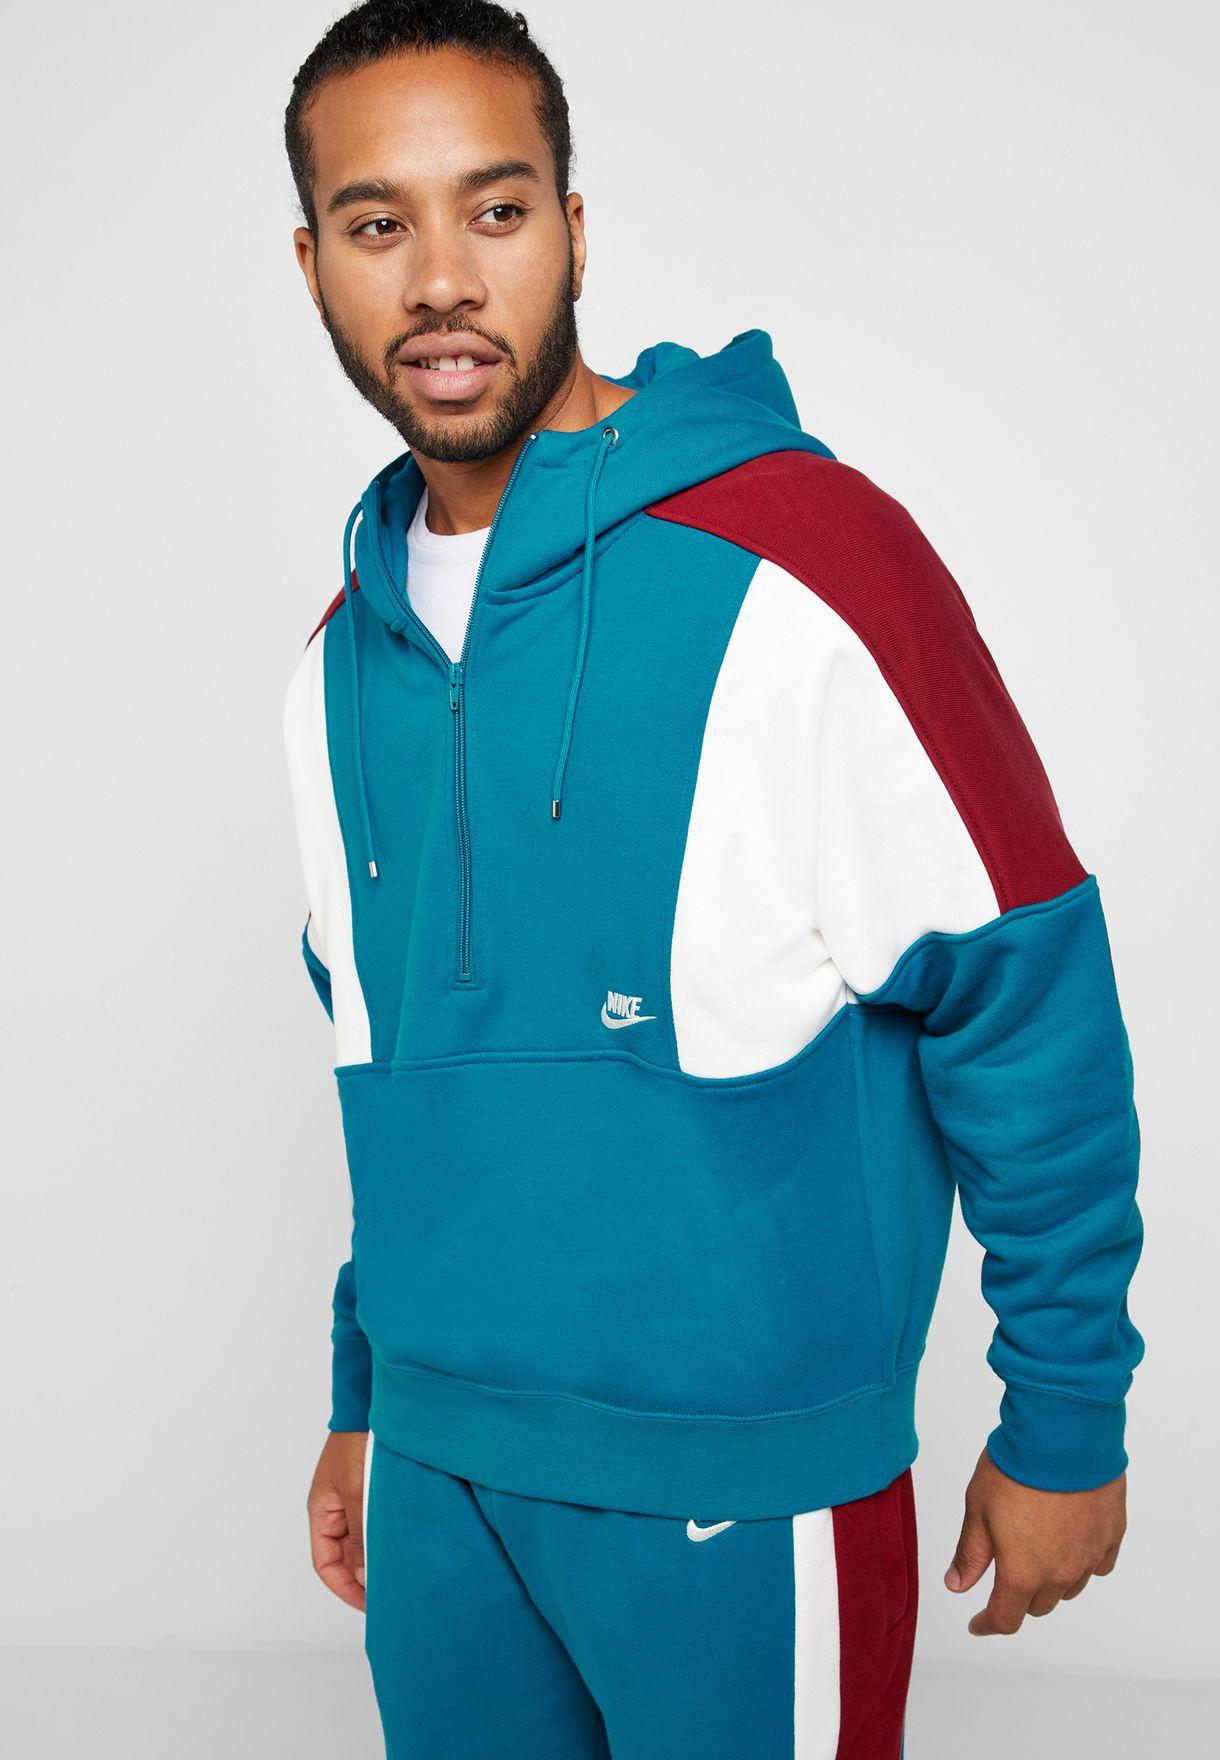 Predownload: Buy Nike Blue Reissue Fleece Sweatshirt For Men In Mena Worldwide Aq2065 301 [ 1760 x 1220 Pixel ]